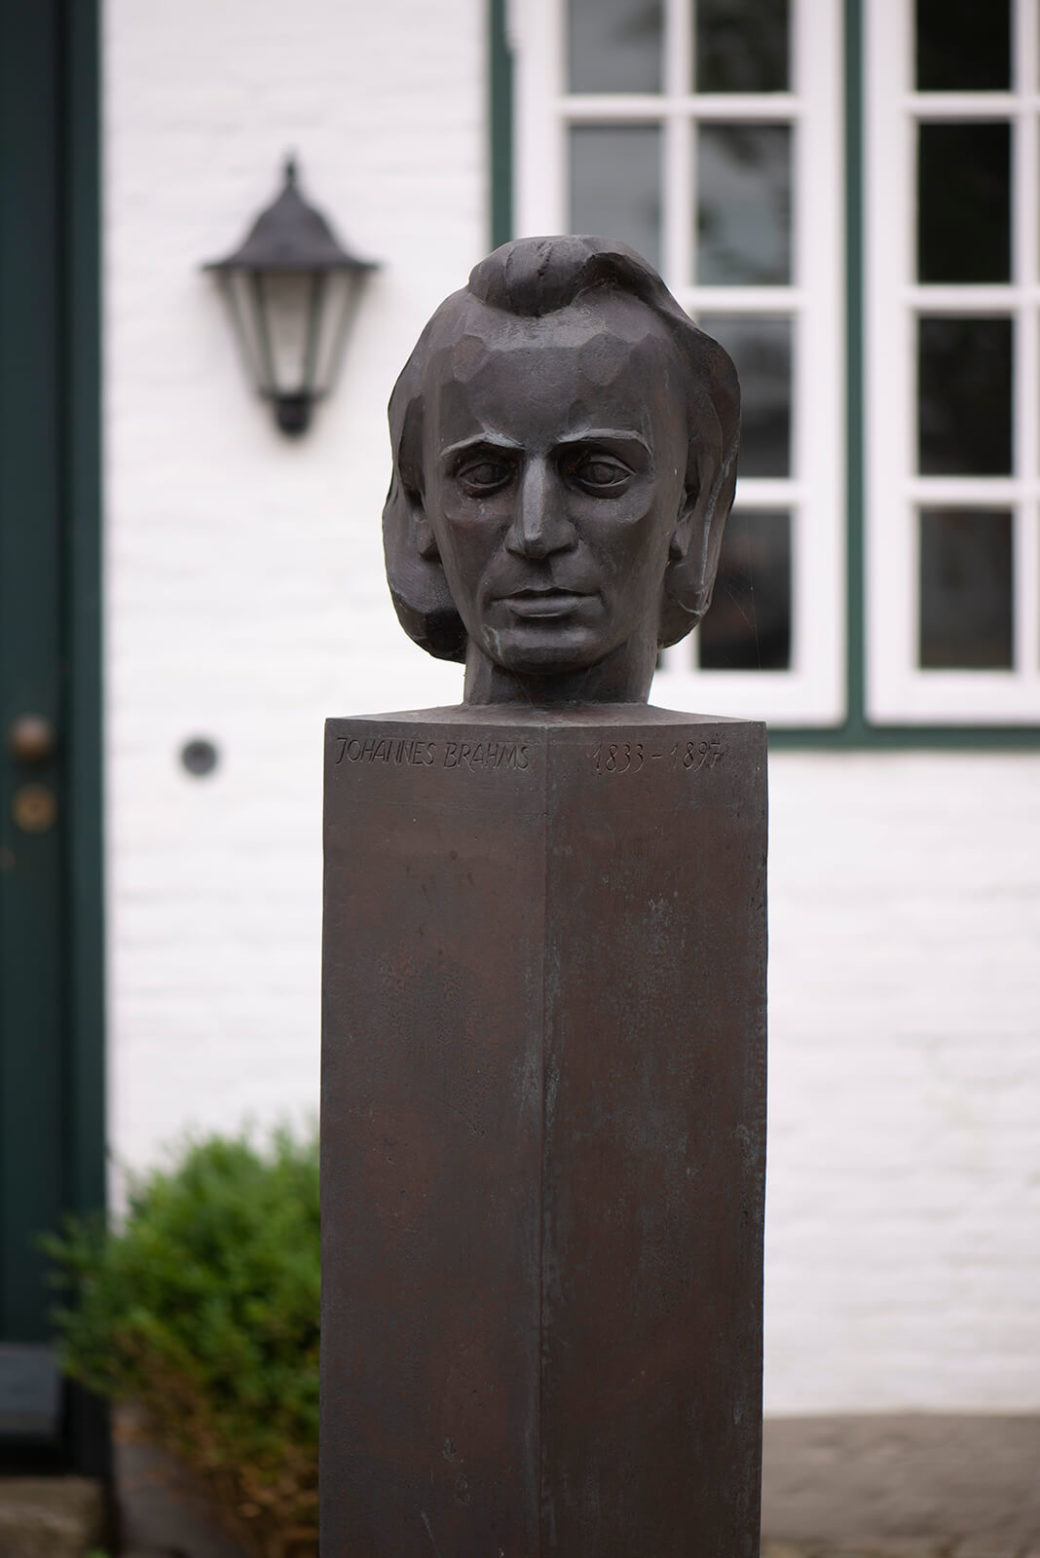 Manfred Sihle-Wissel: Denkmal für Johannes Brahms (Foto: KUNST@SH/Jan Petersen, 2019)